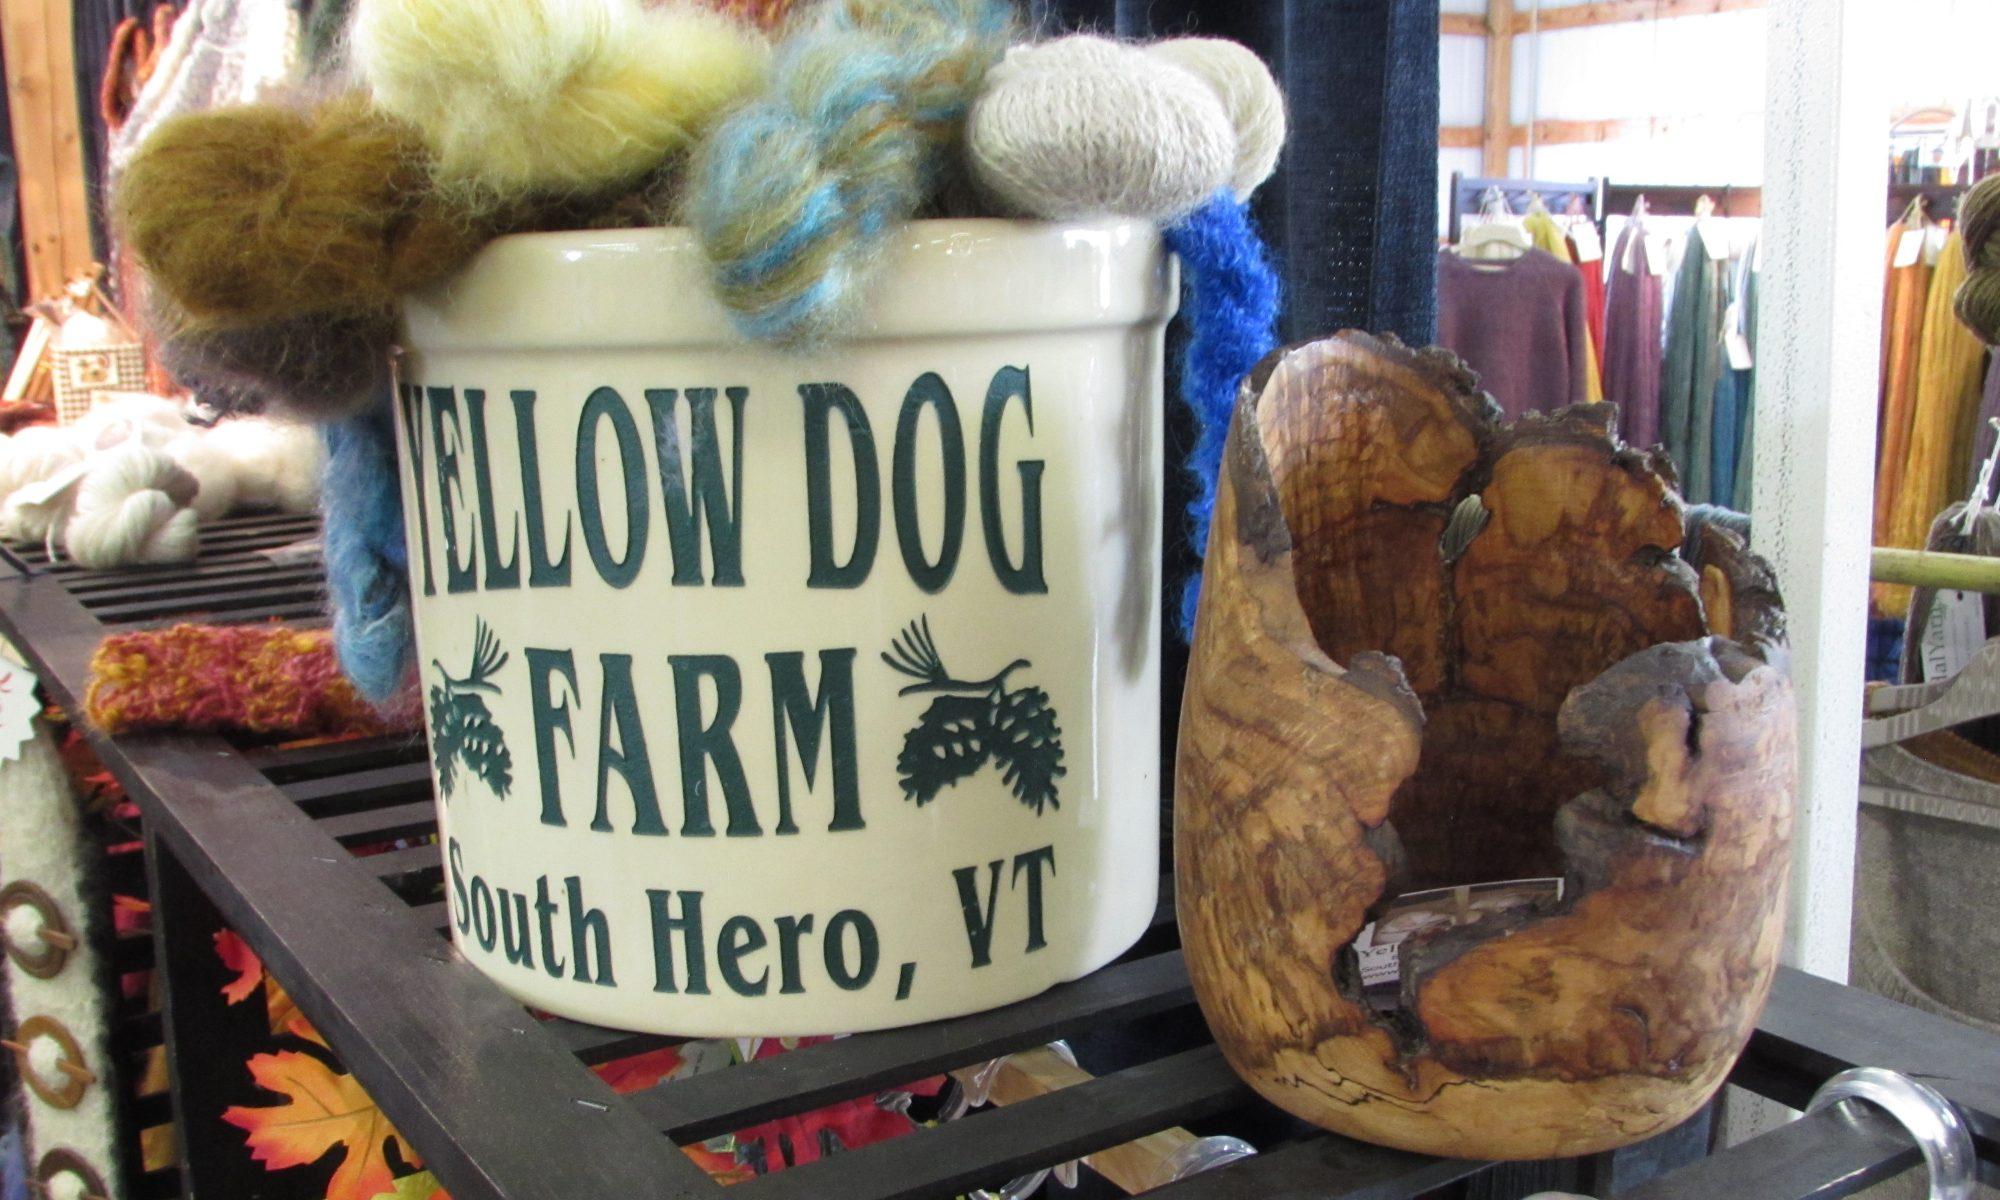 Yellow Dog Farm